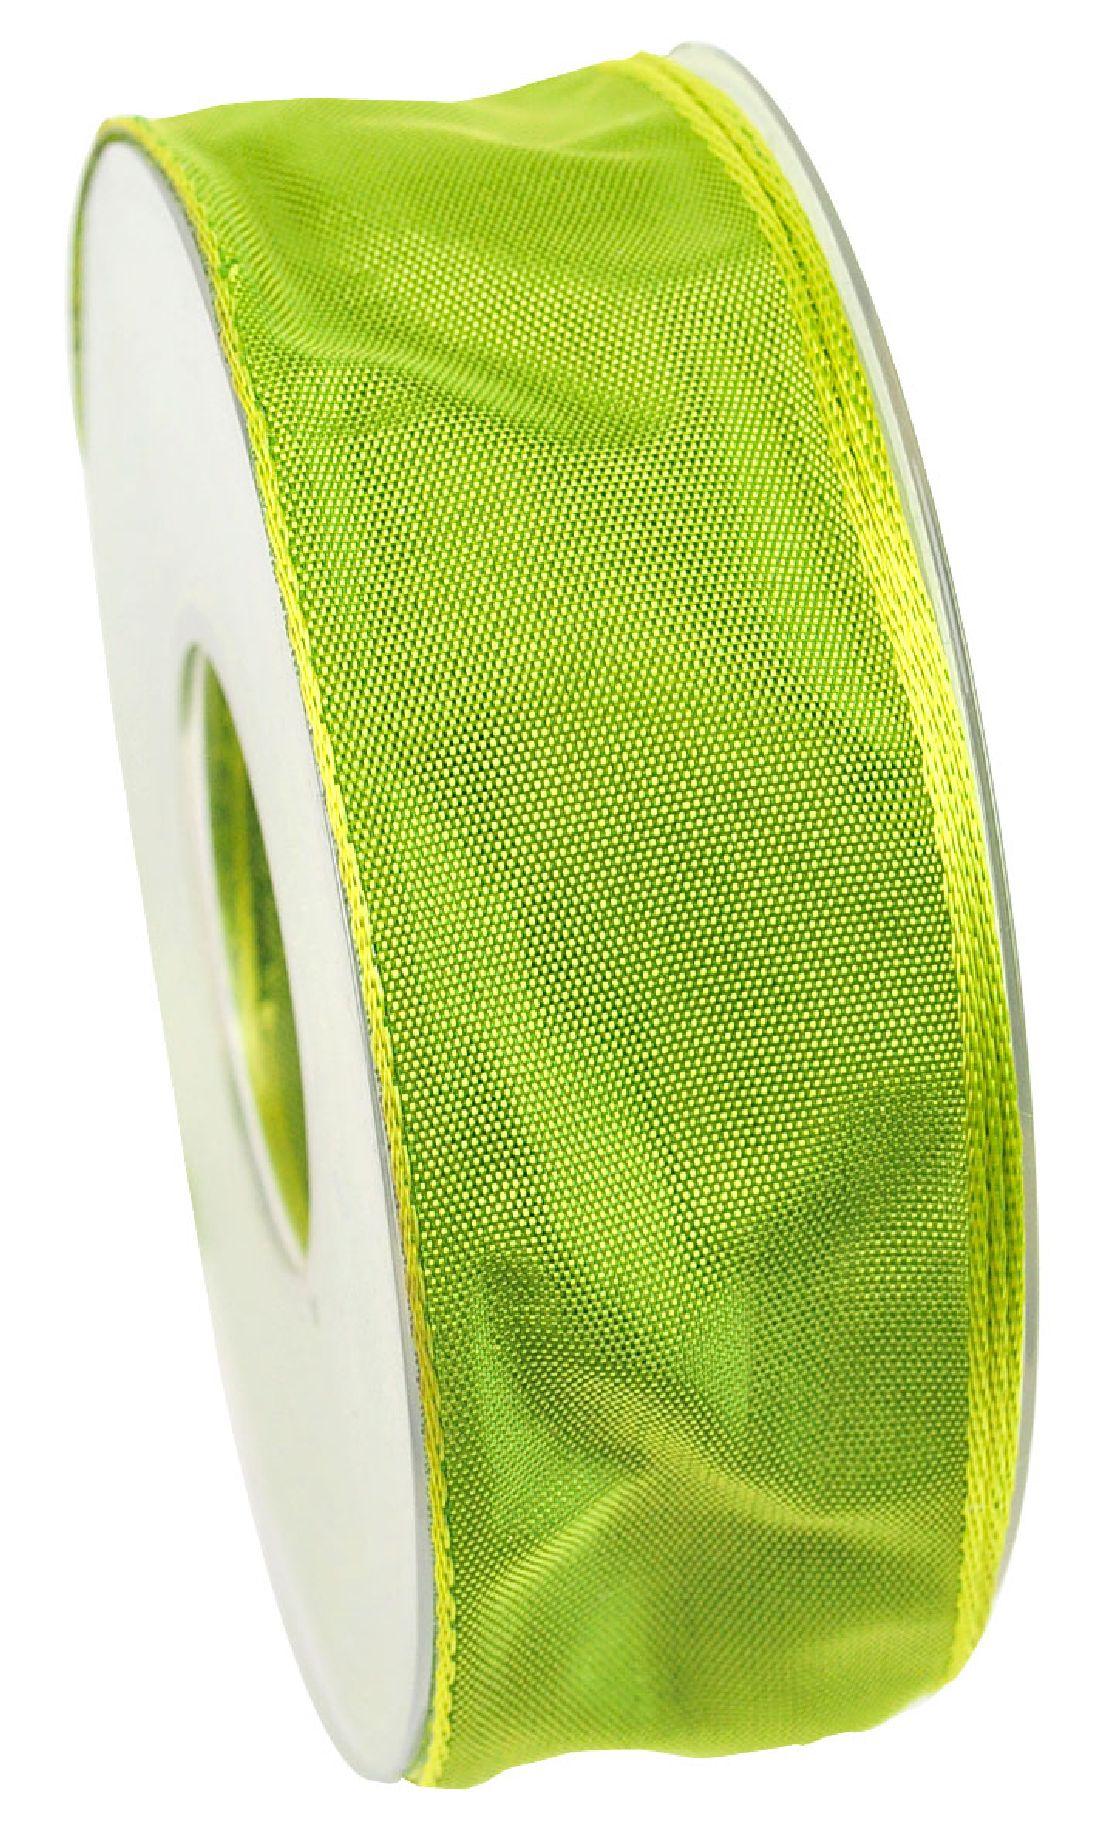 Drahtkantenband hellgrün 551 40mm 25m